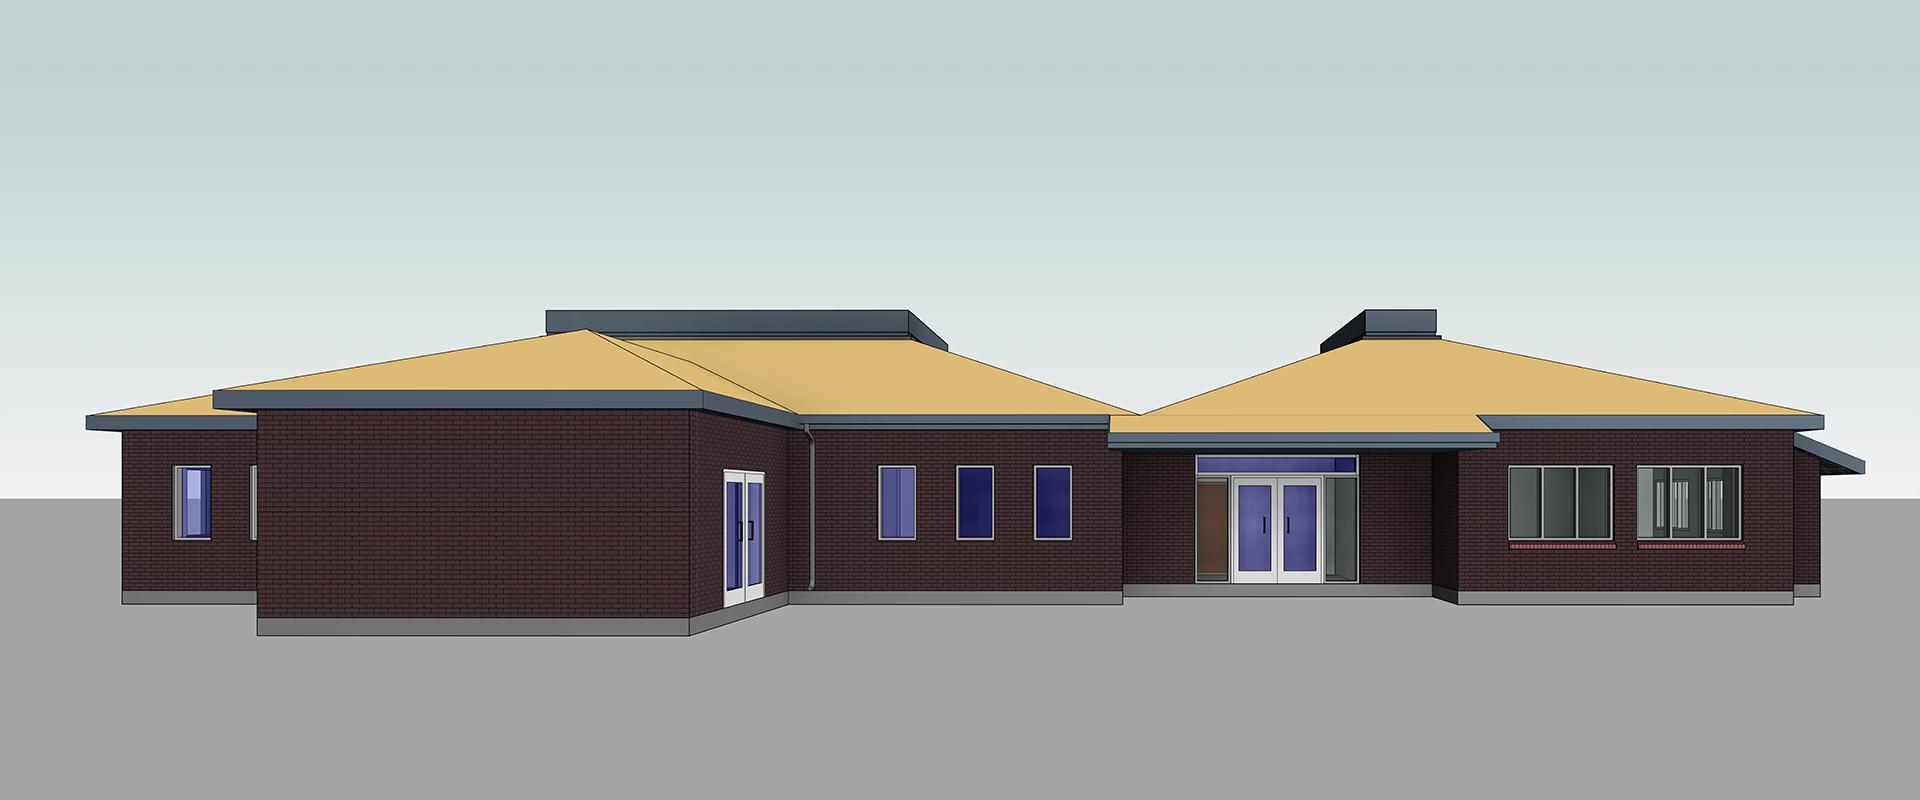 Architectural_Revit_Modeling_Birken-Inspection-Lab_BIM_Project-by-United-BIM